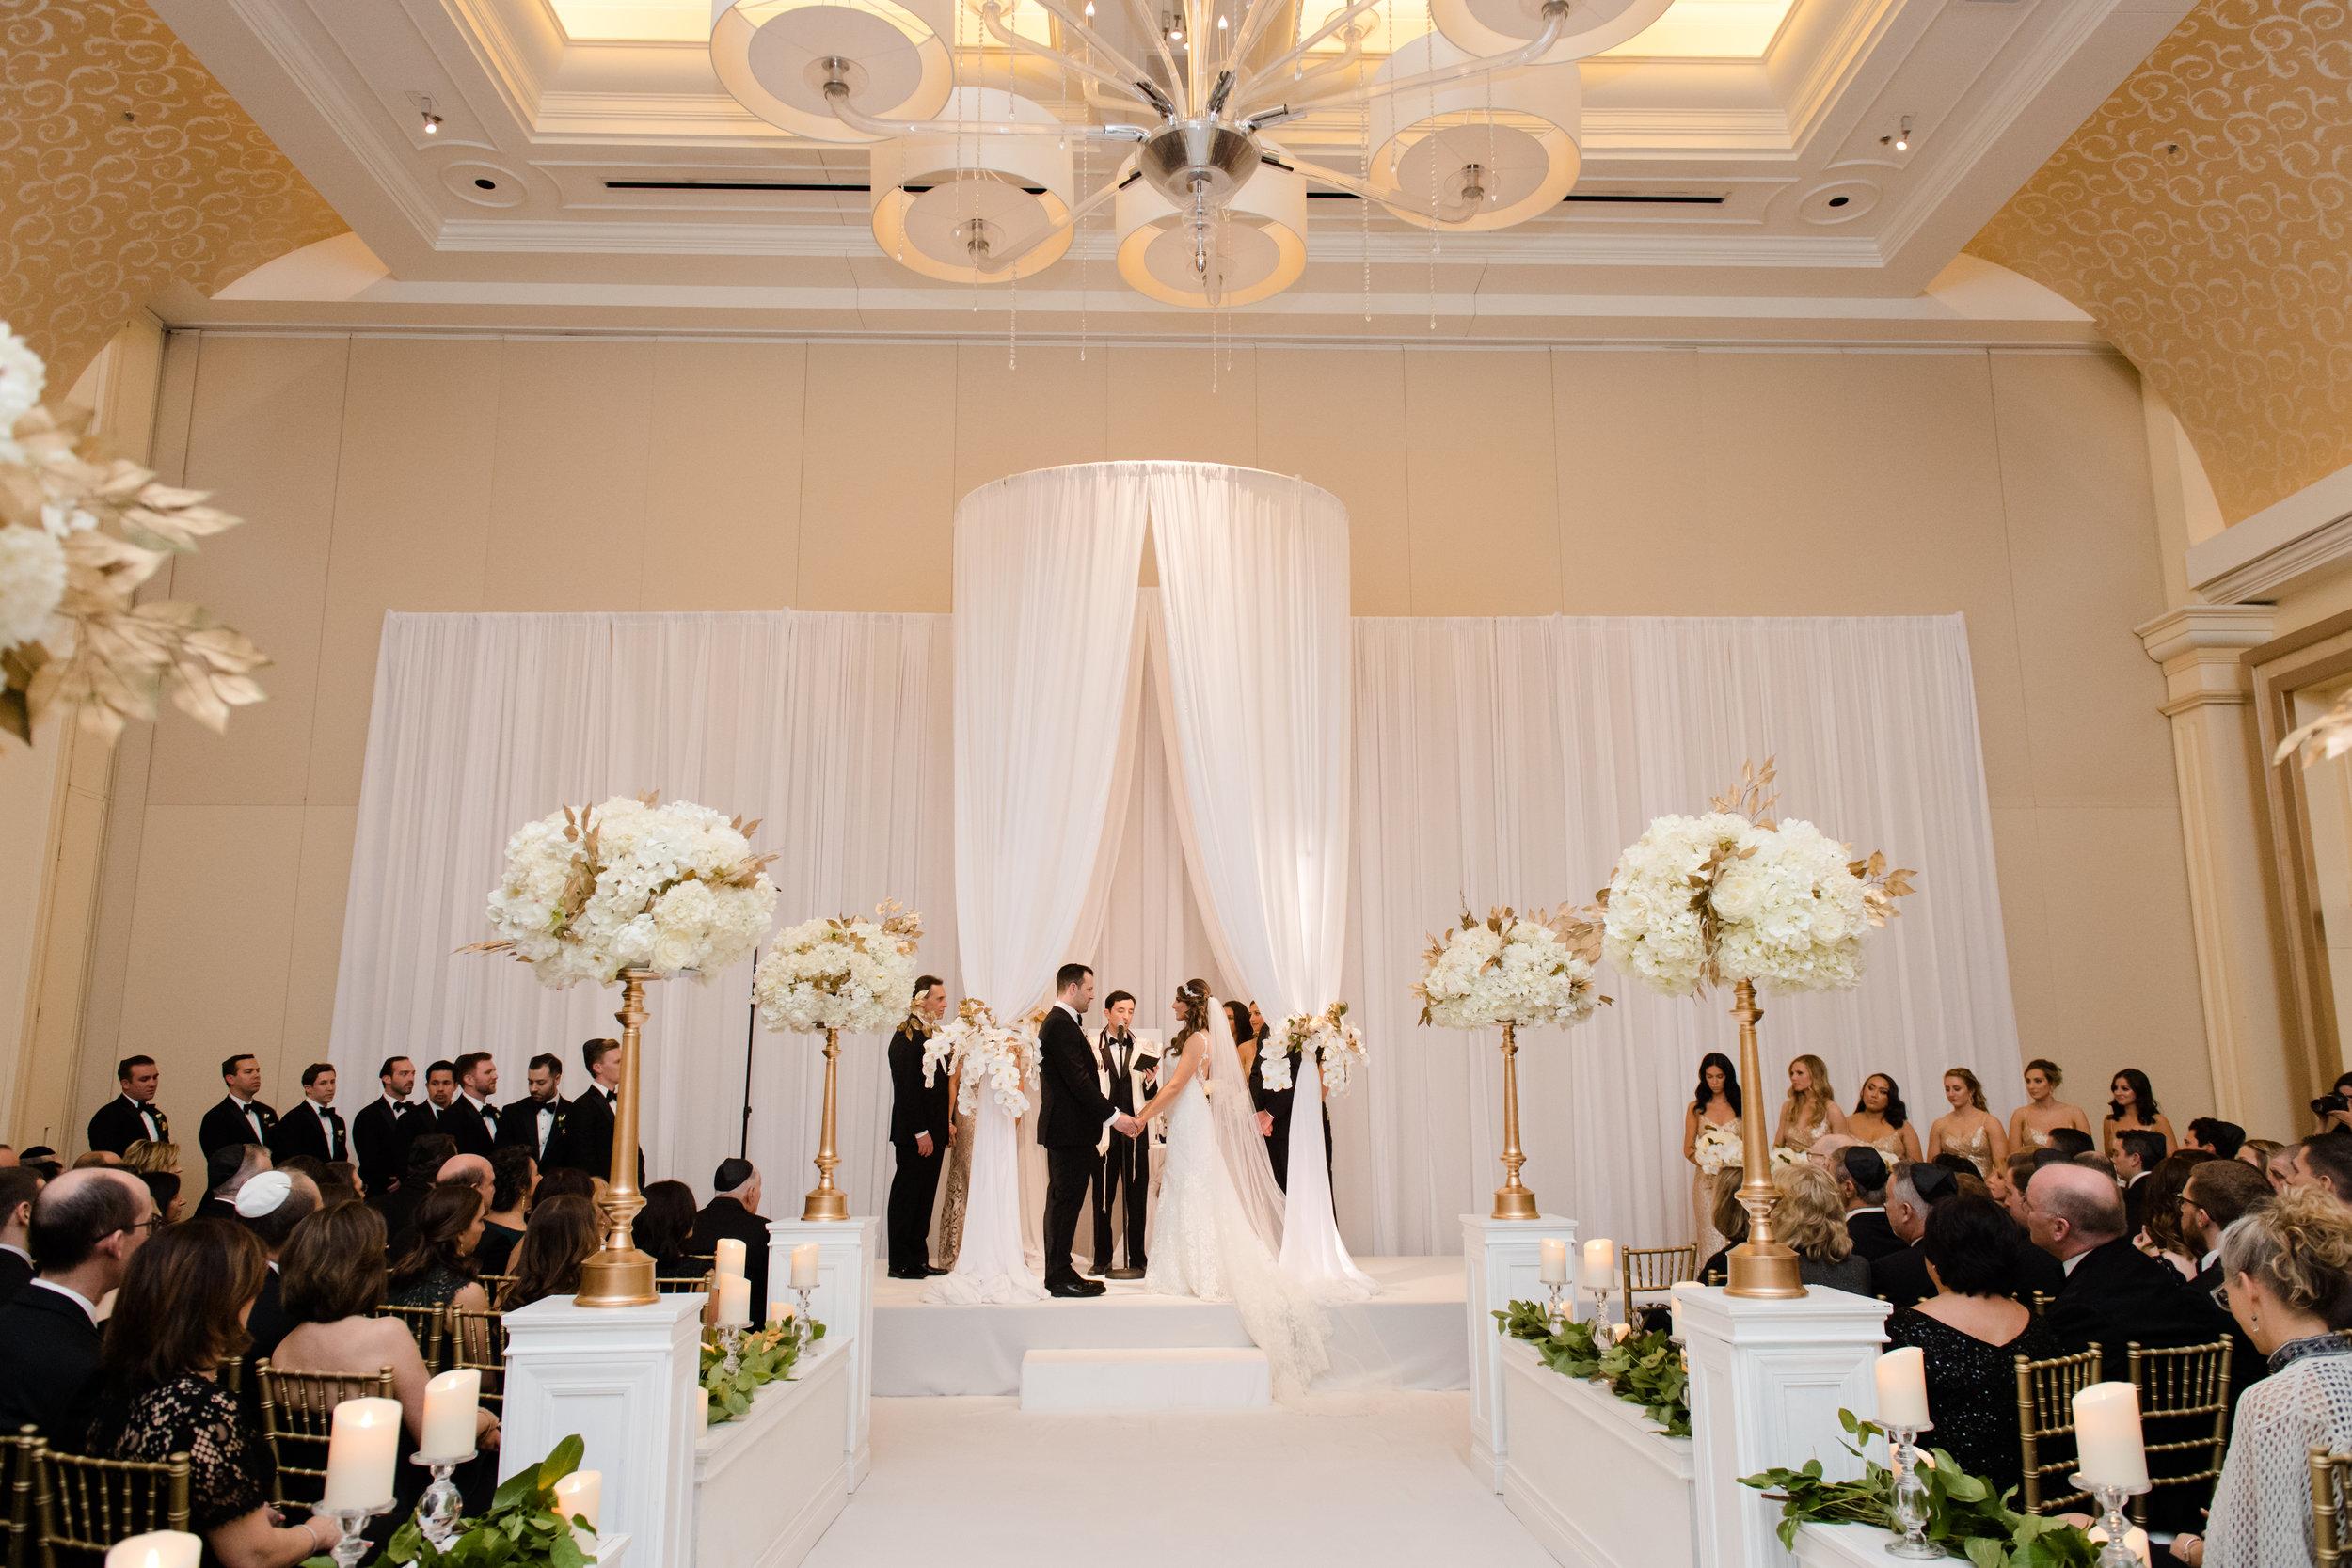 Elegant wedding at the JW Marriott Chicago20.jpg